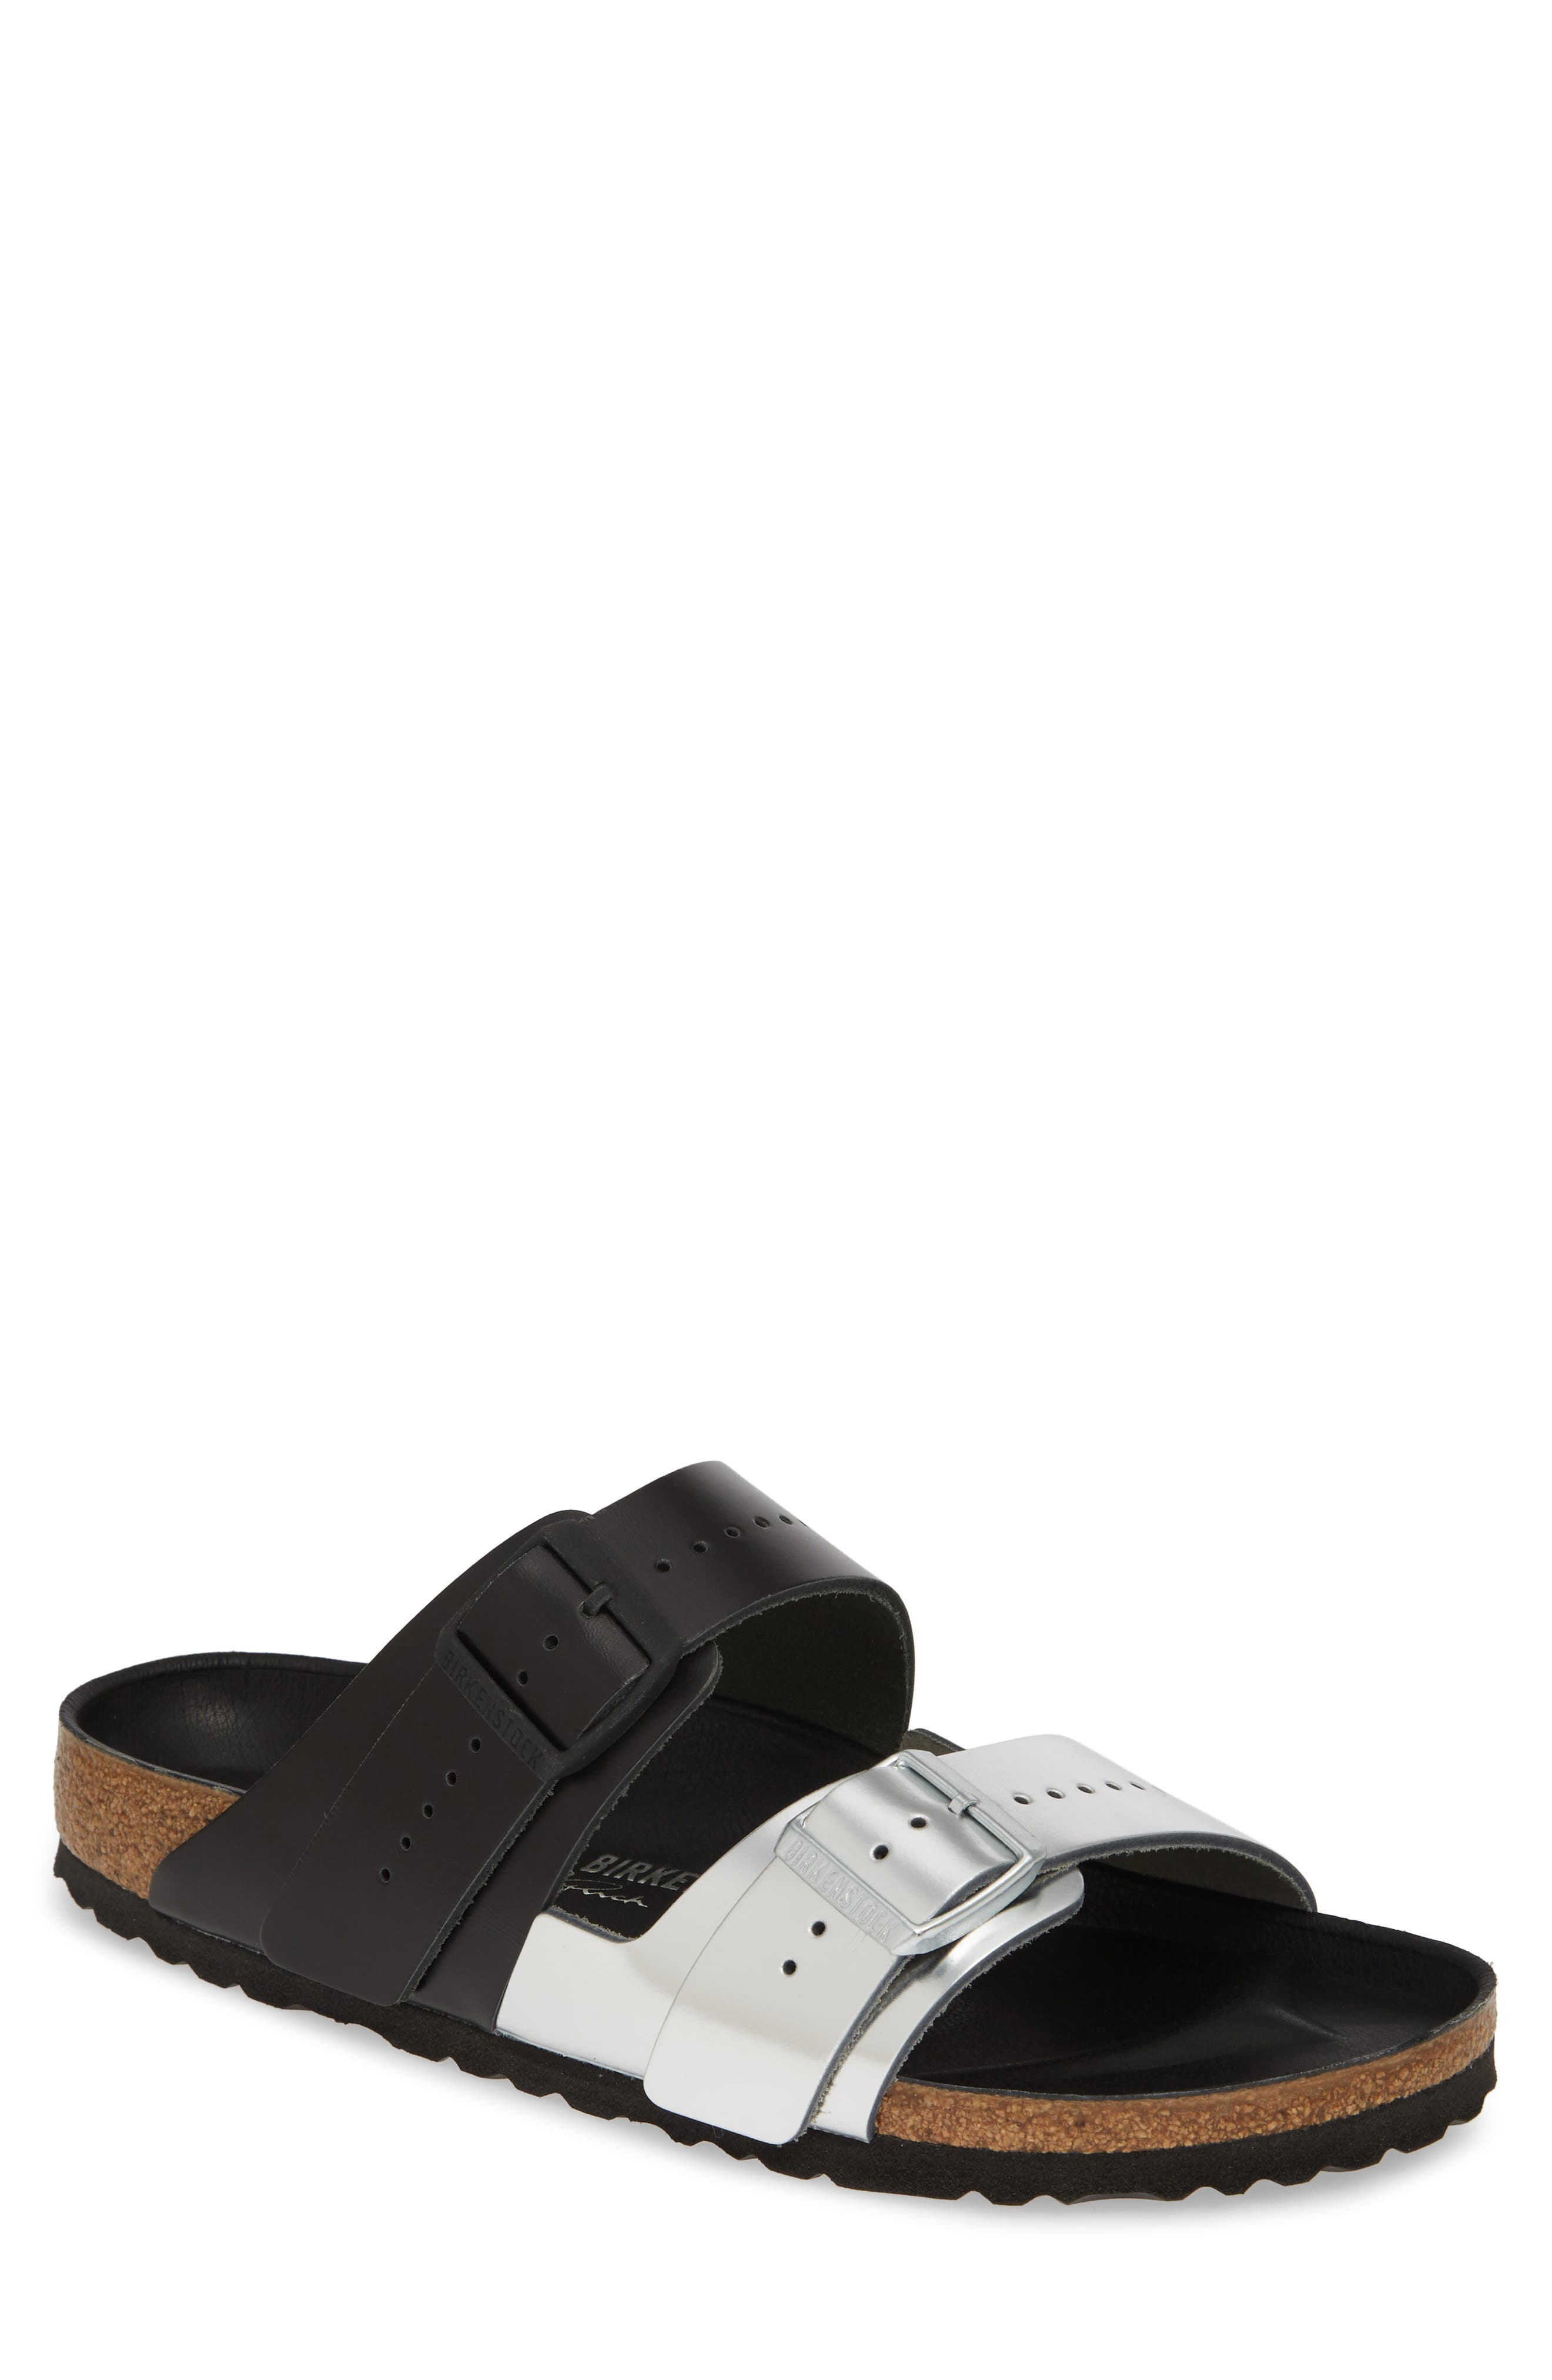 Rick Owens x Birkenstock Arizona Sandal, Main, color, BLACK/ SILVER